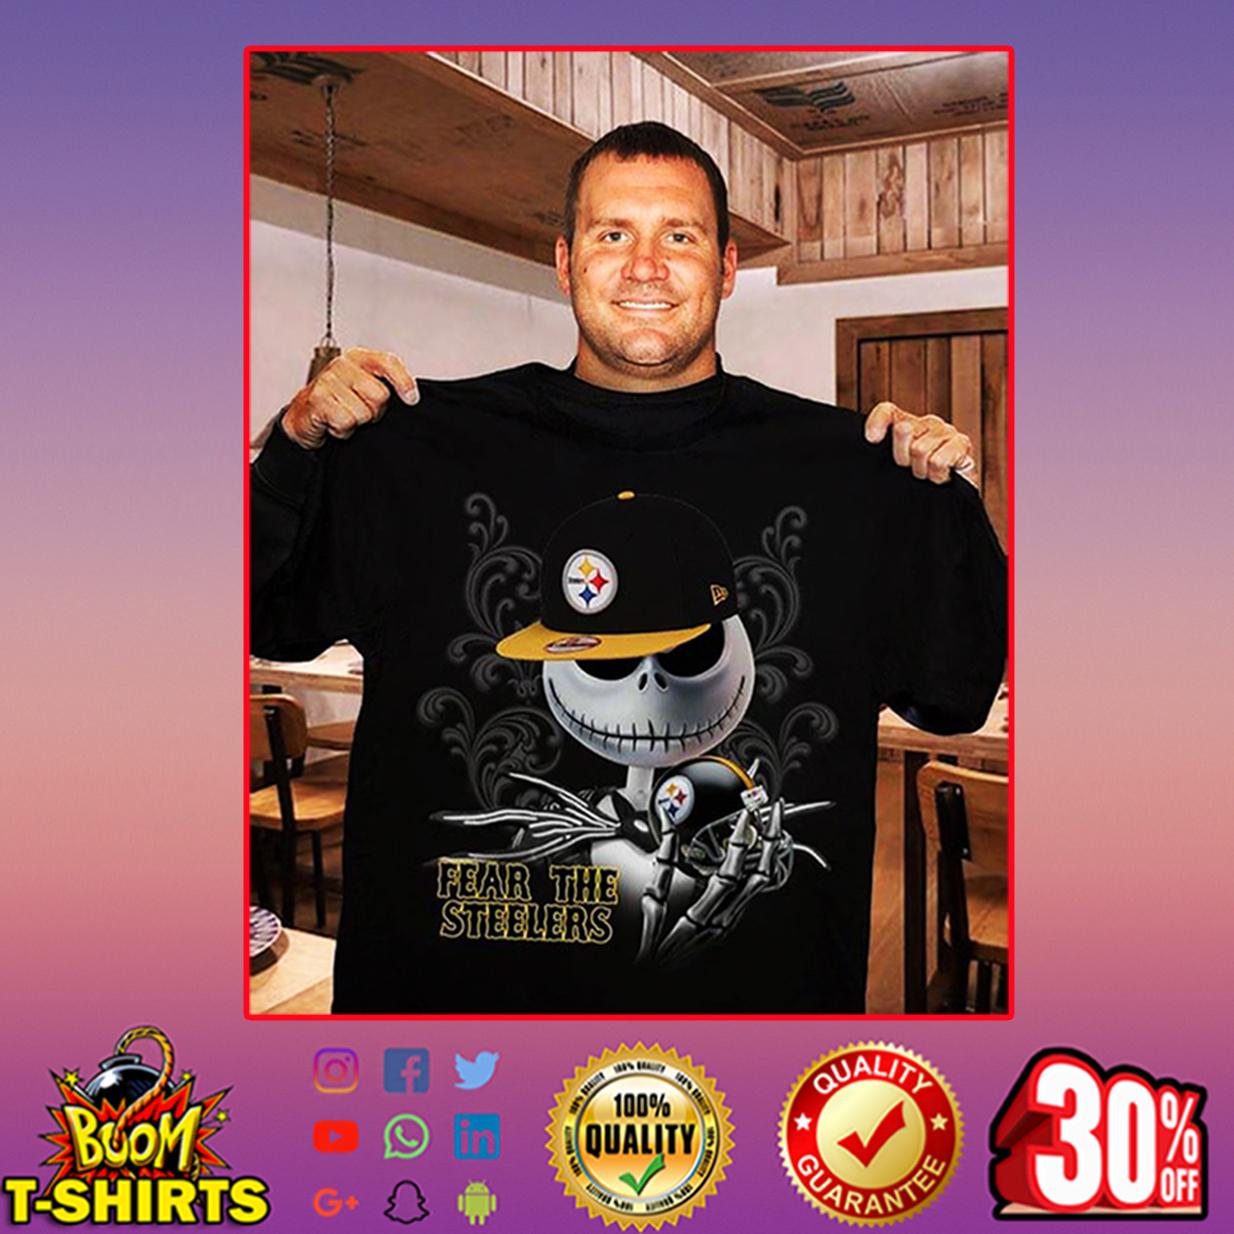 Jack Skellington Fear The Cowboys long sleeved t-shirt